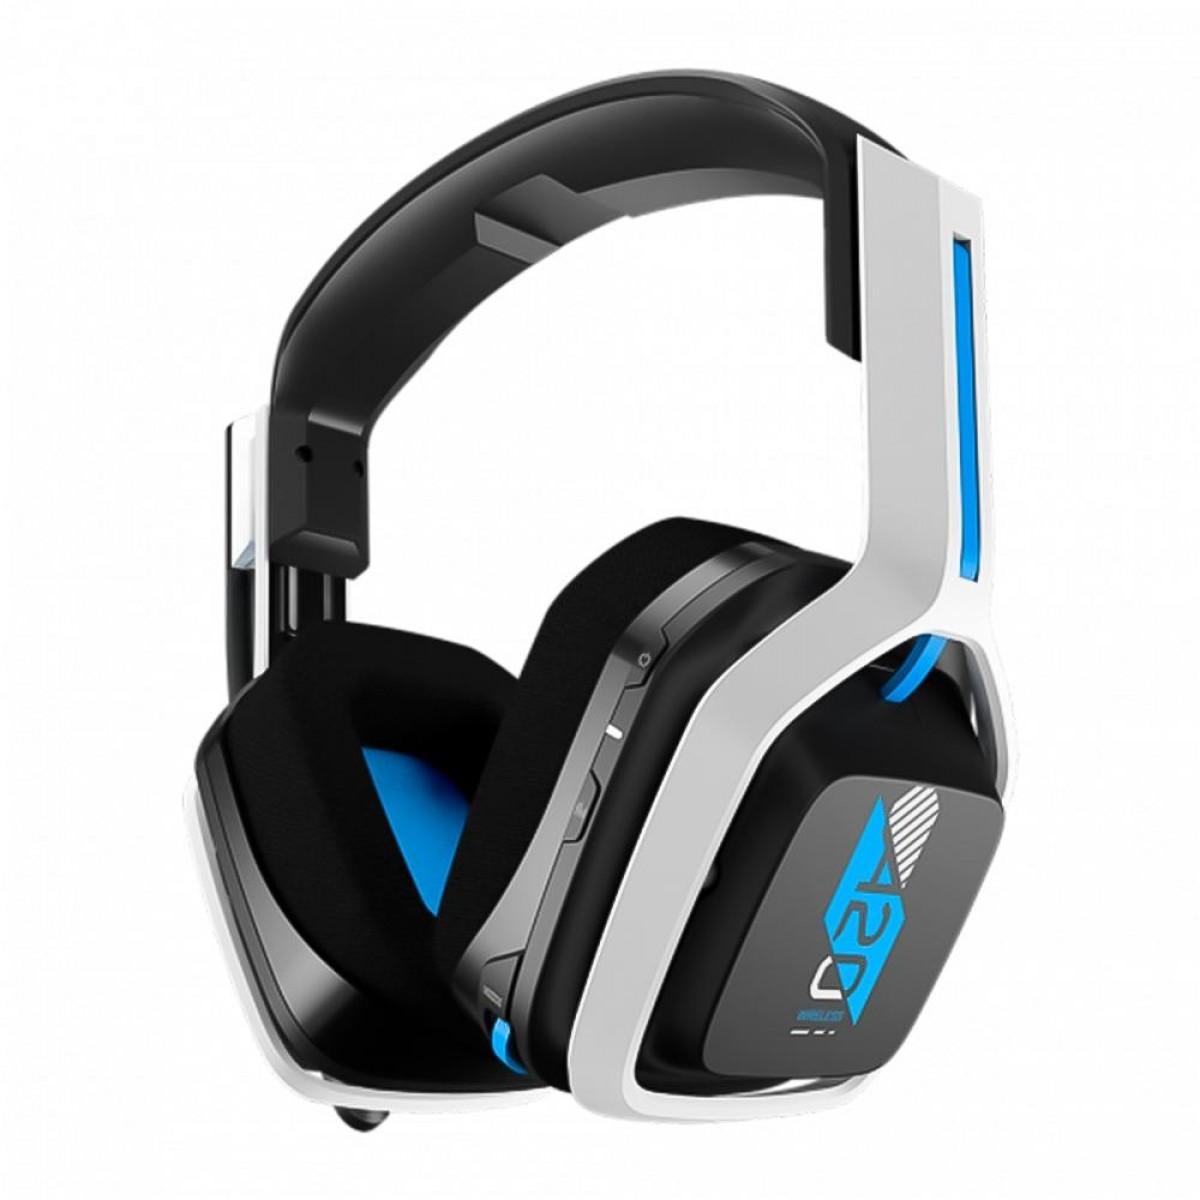 Headset Gamer Logitech Astro A20 Gen 2, USB, PS5/4, PC/MAC, White/Blue, 939-001877